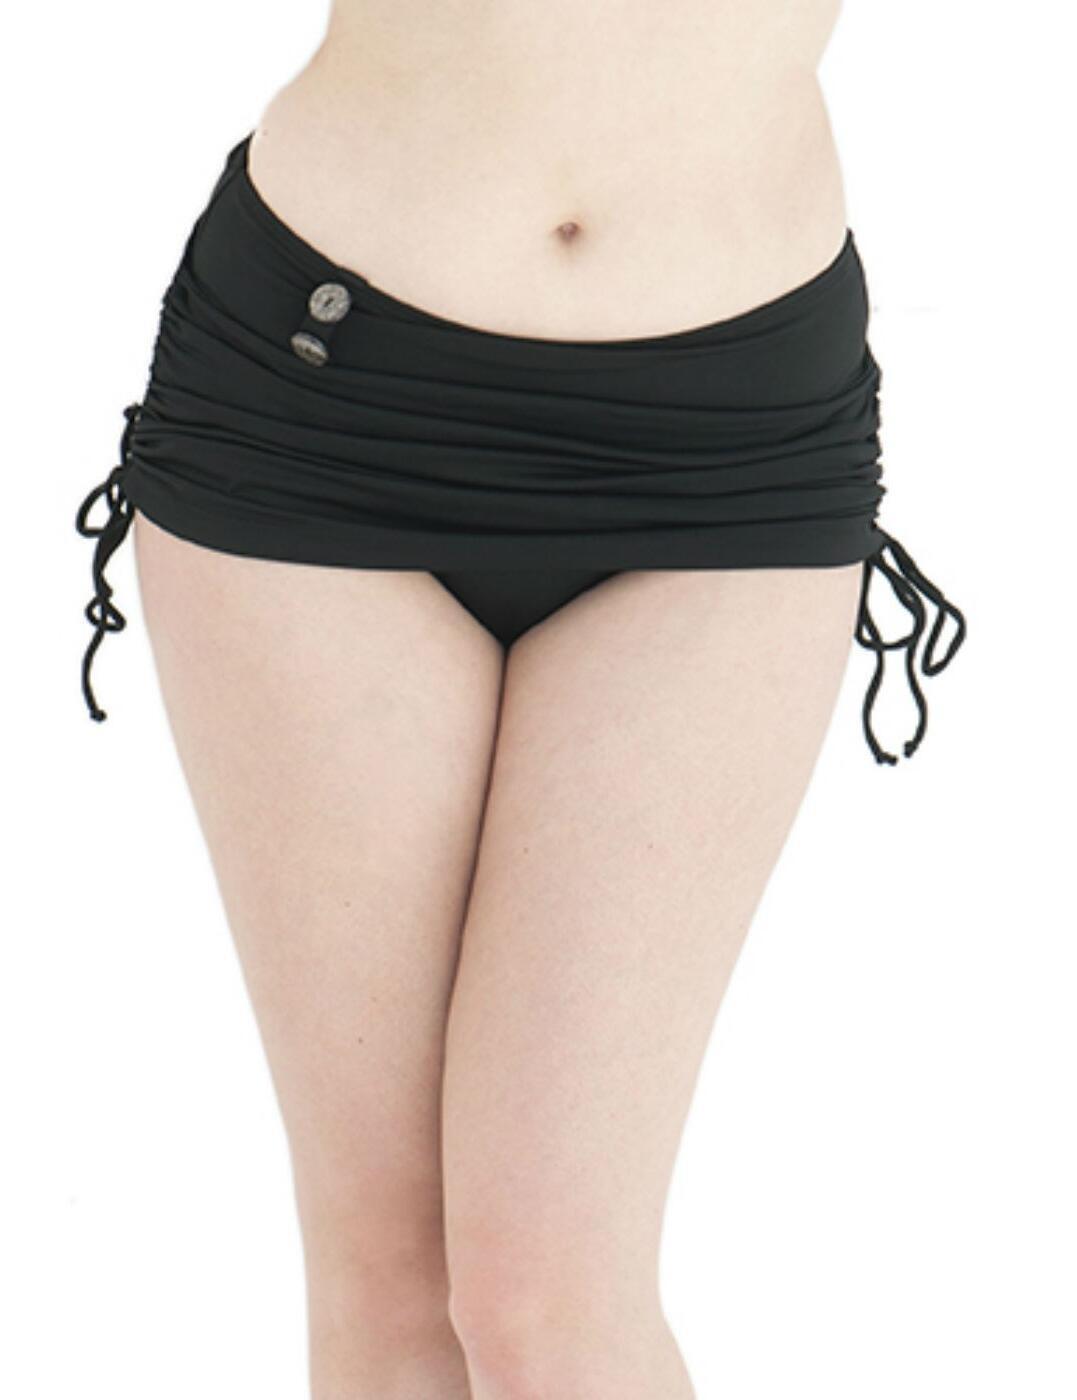 CS1955 Curvy Kate Luau Love Swim Skirt - CS1955 Black